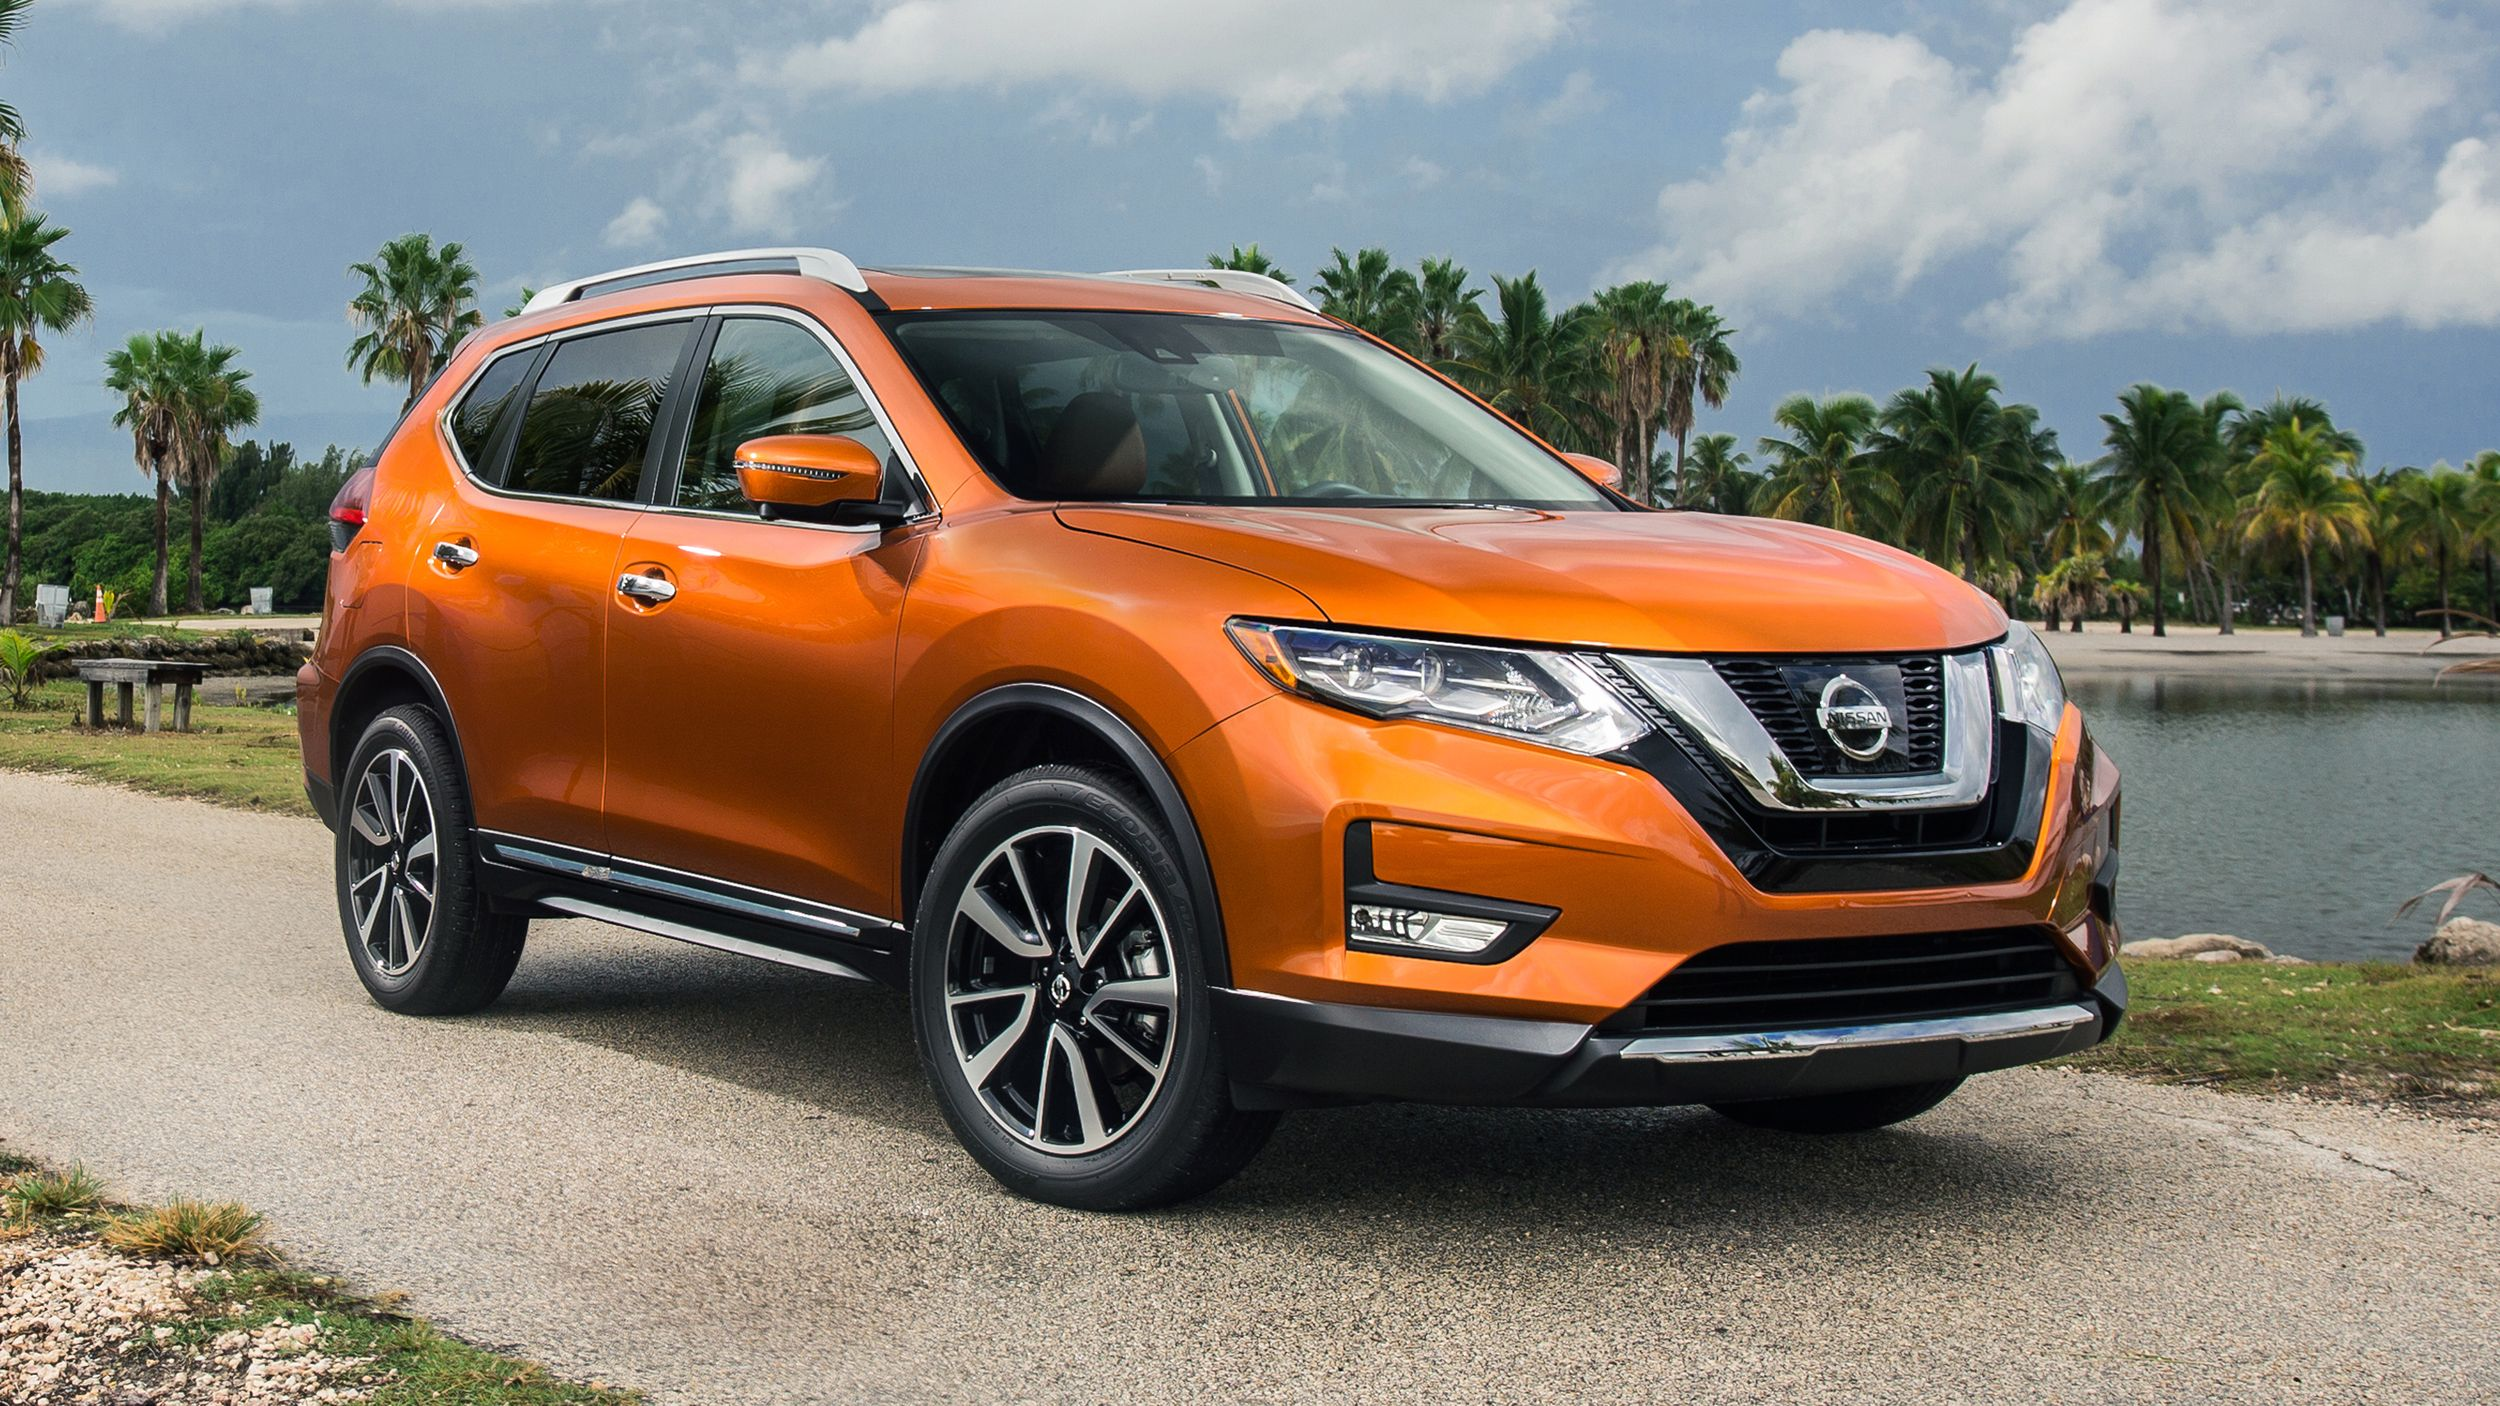 Nissan Xtrail 2018 Suv models, Nissan, Mazda suv